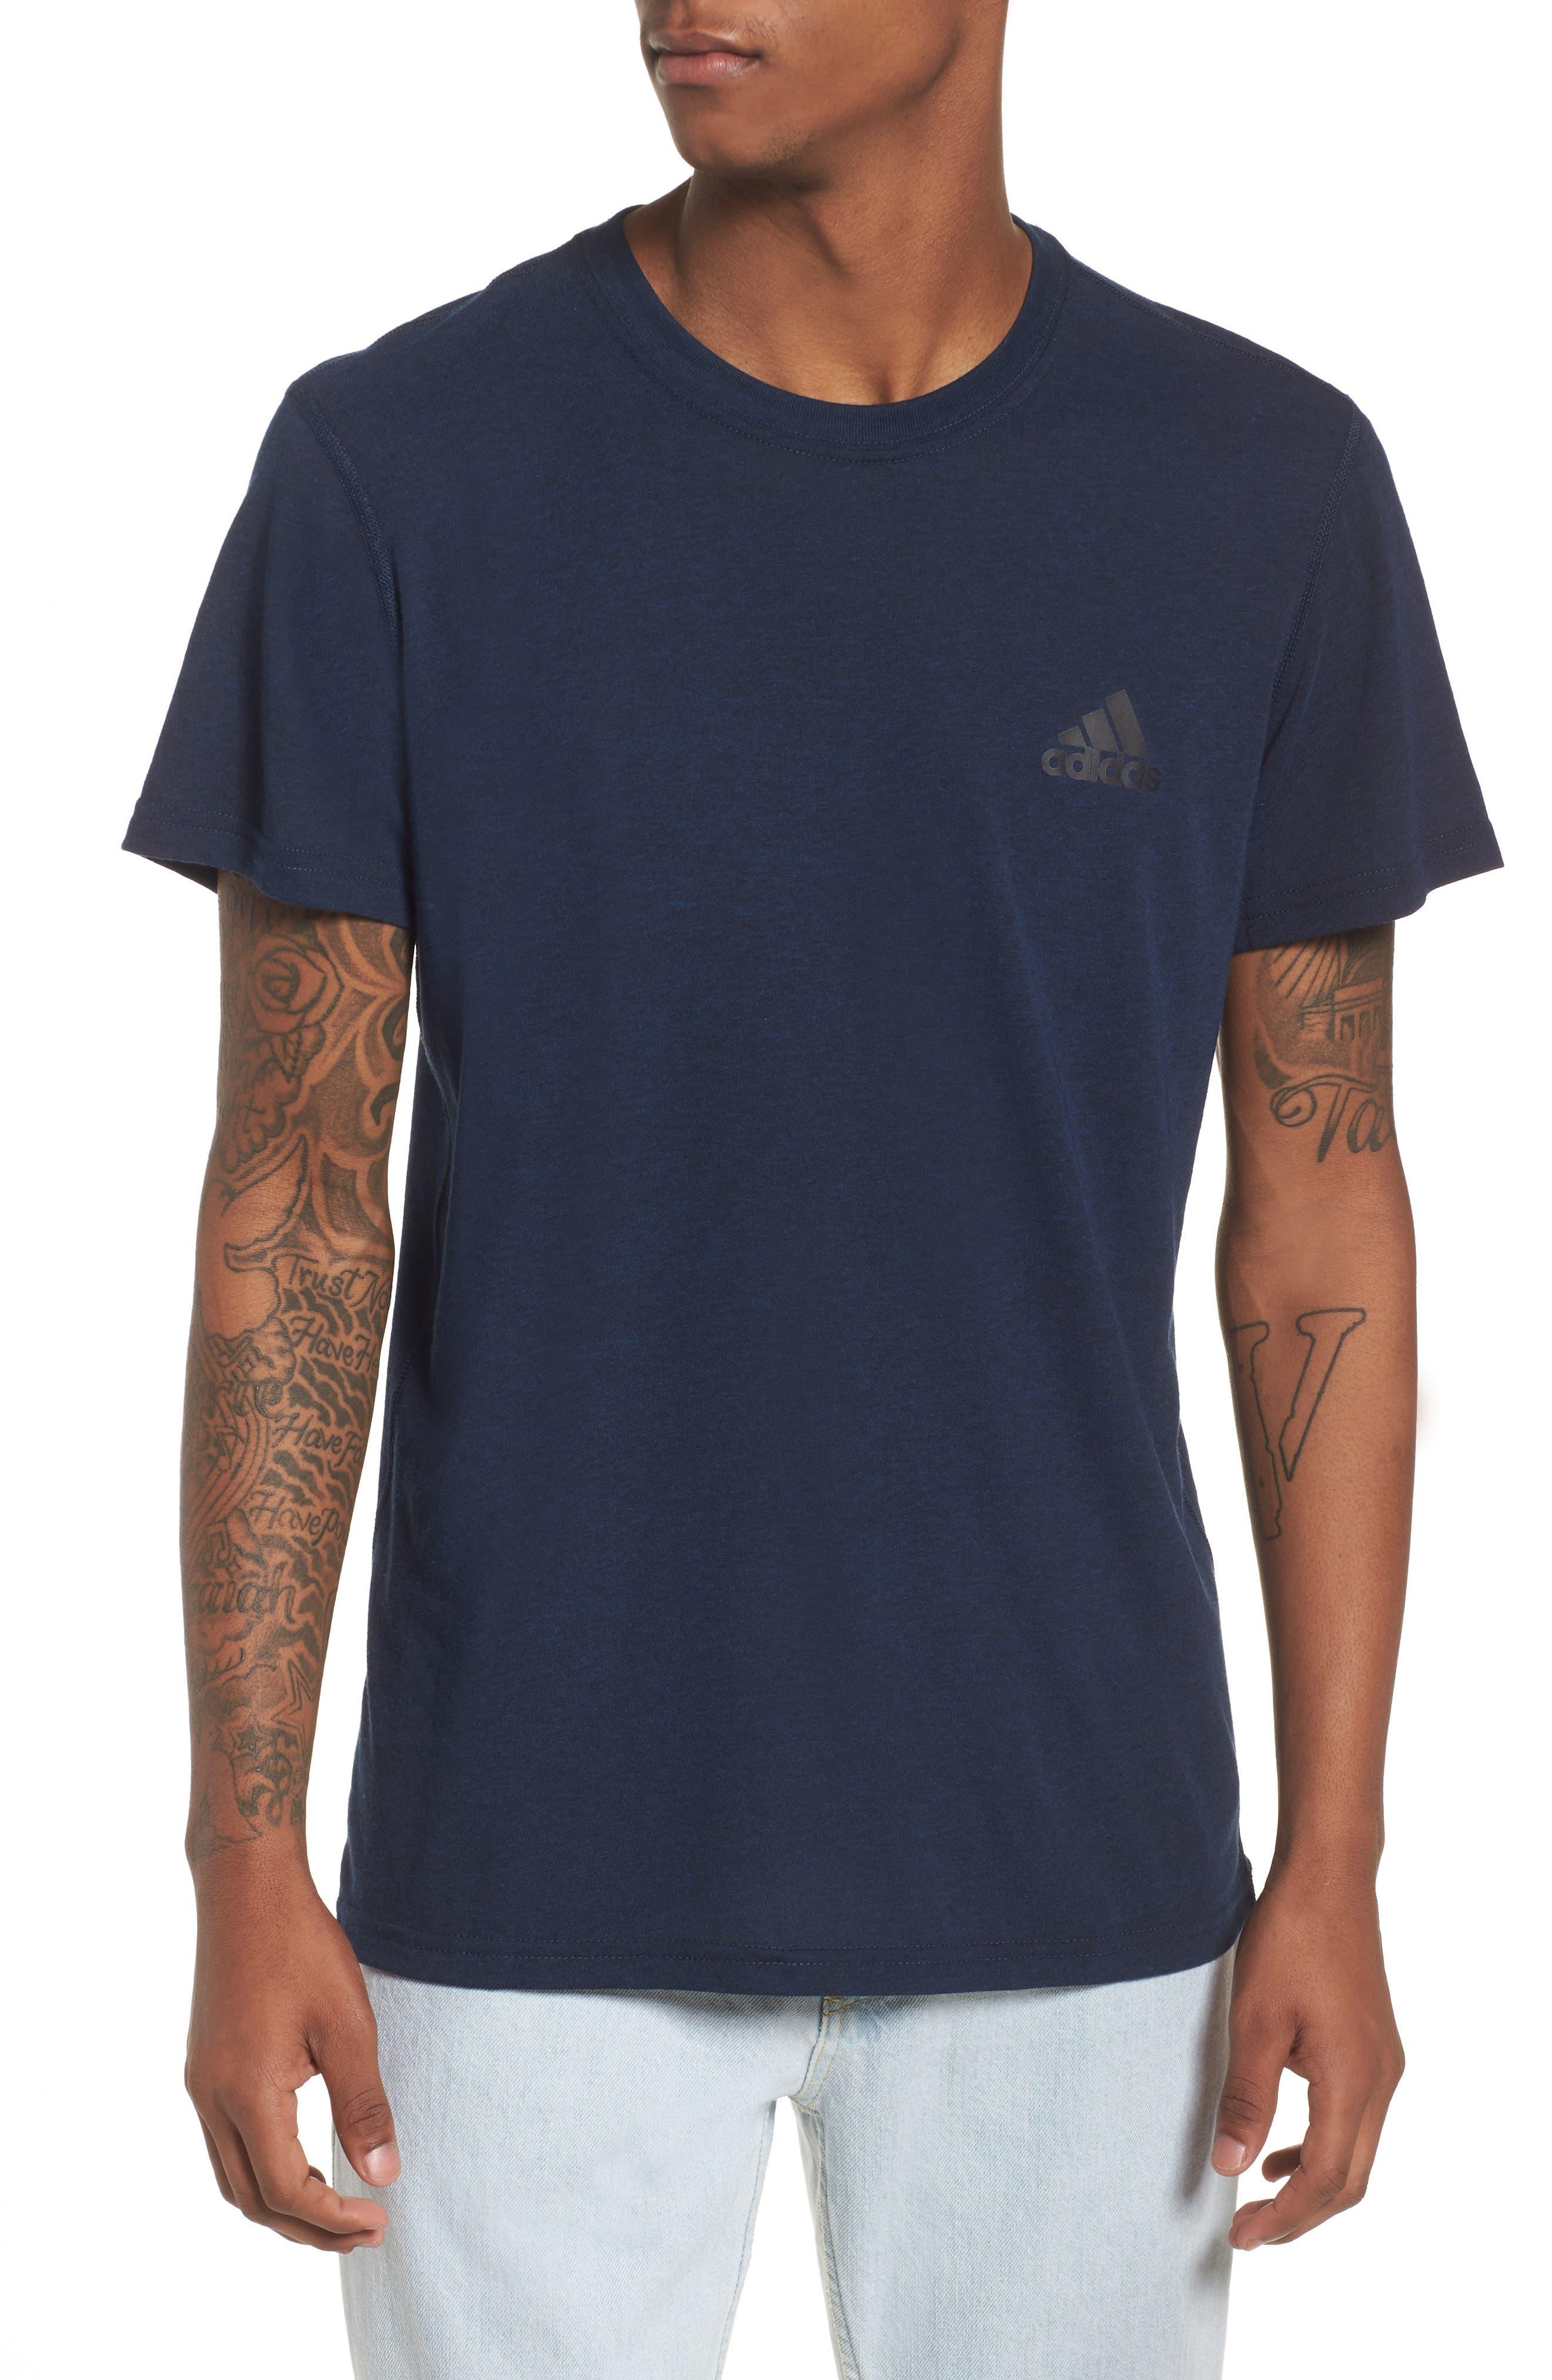 Ult Crewneck T-Shirt,                         Main,                         color, Black/ Royal/ Heather